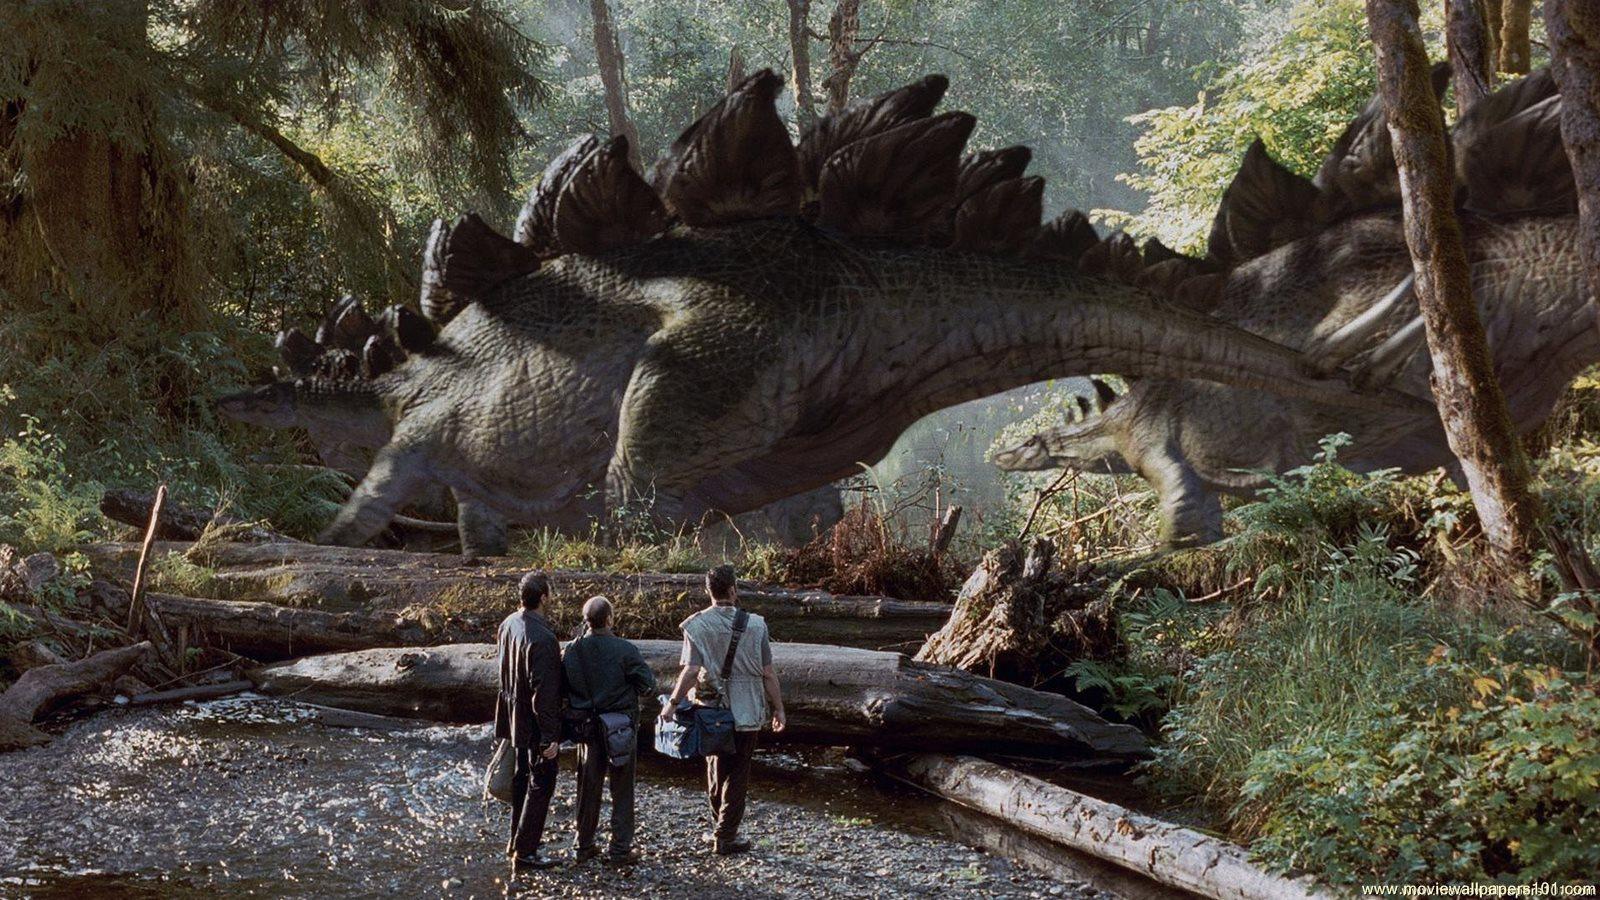 Jurassic World Math Applications